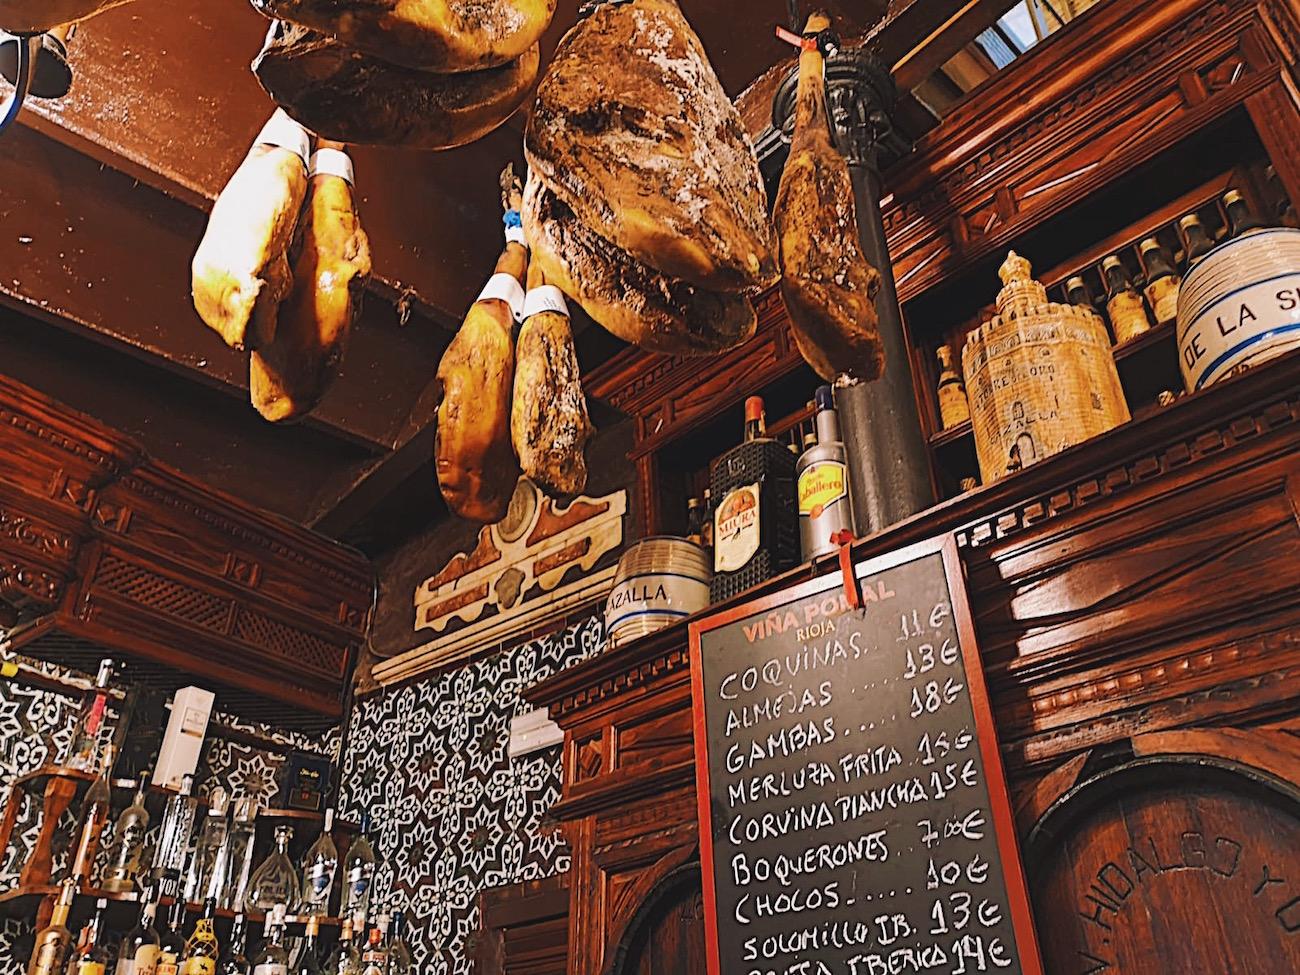 redhead-round-the-world-blogger-food-foodie-foodblog-spain-el-rinconcillo-inside-jamon-menu.JPG